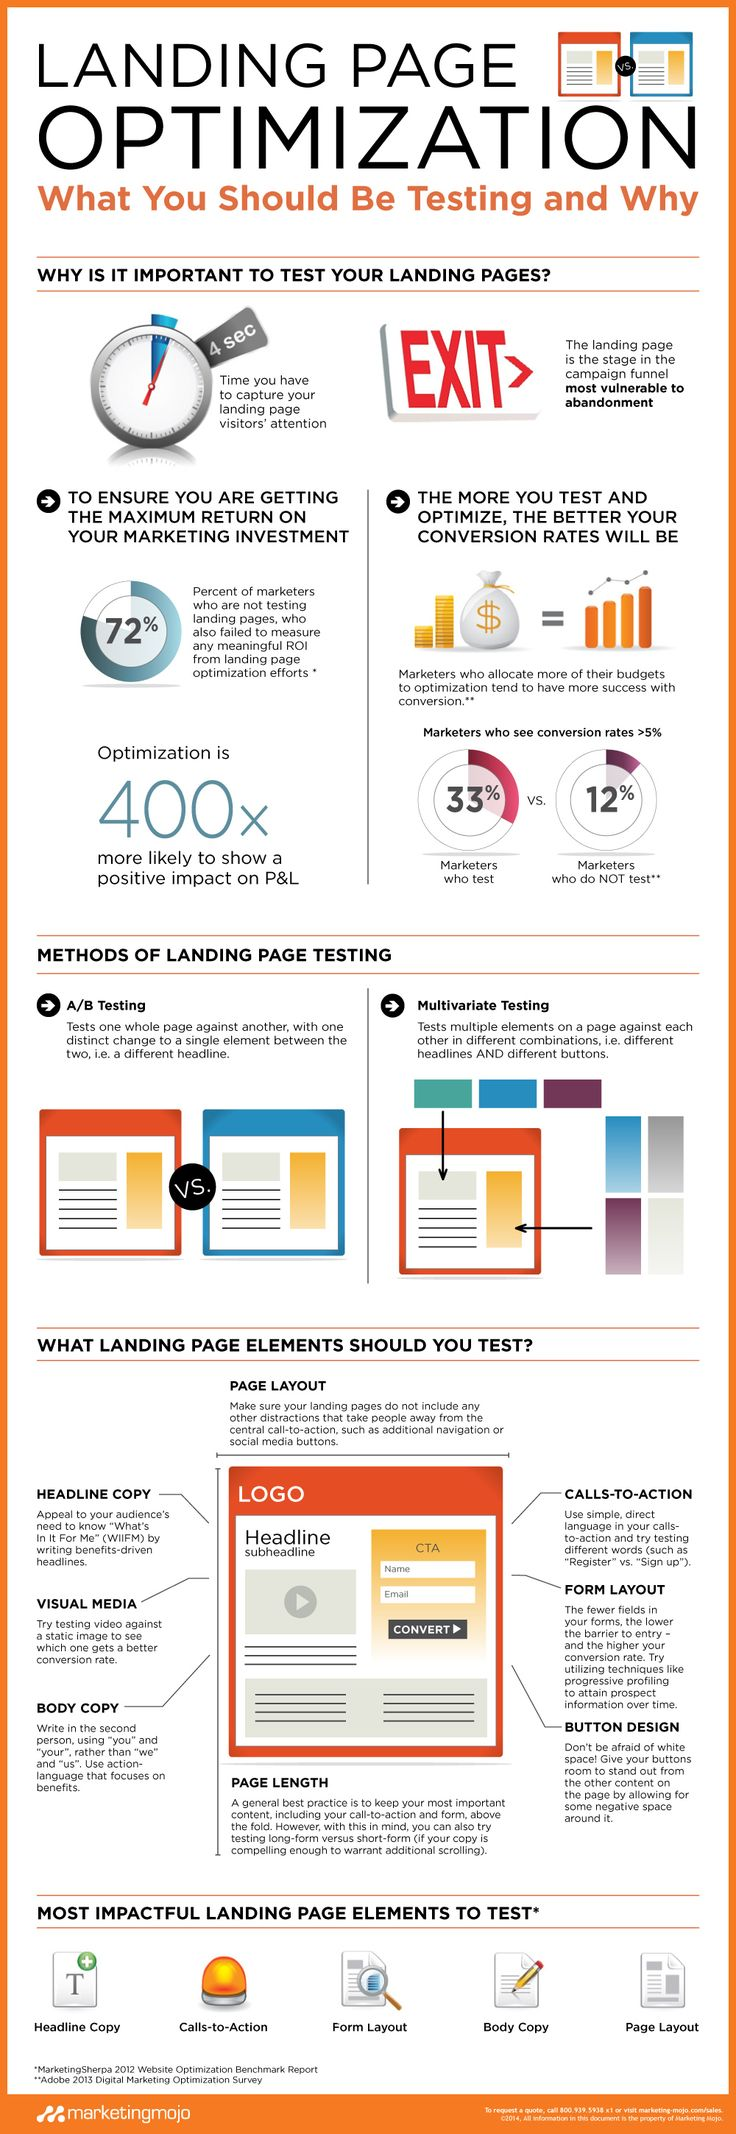 Testea si tu landing page funciona #marketingonline #landingpage